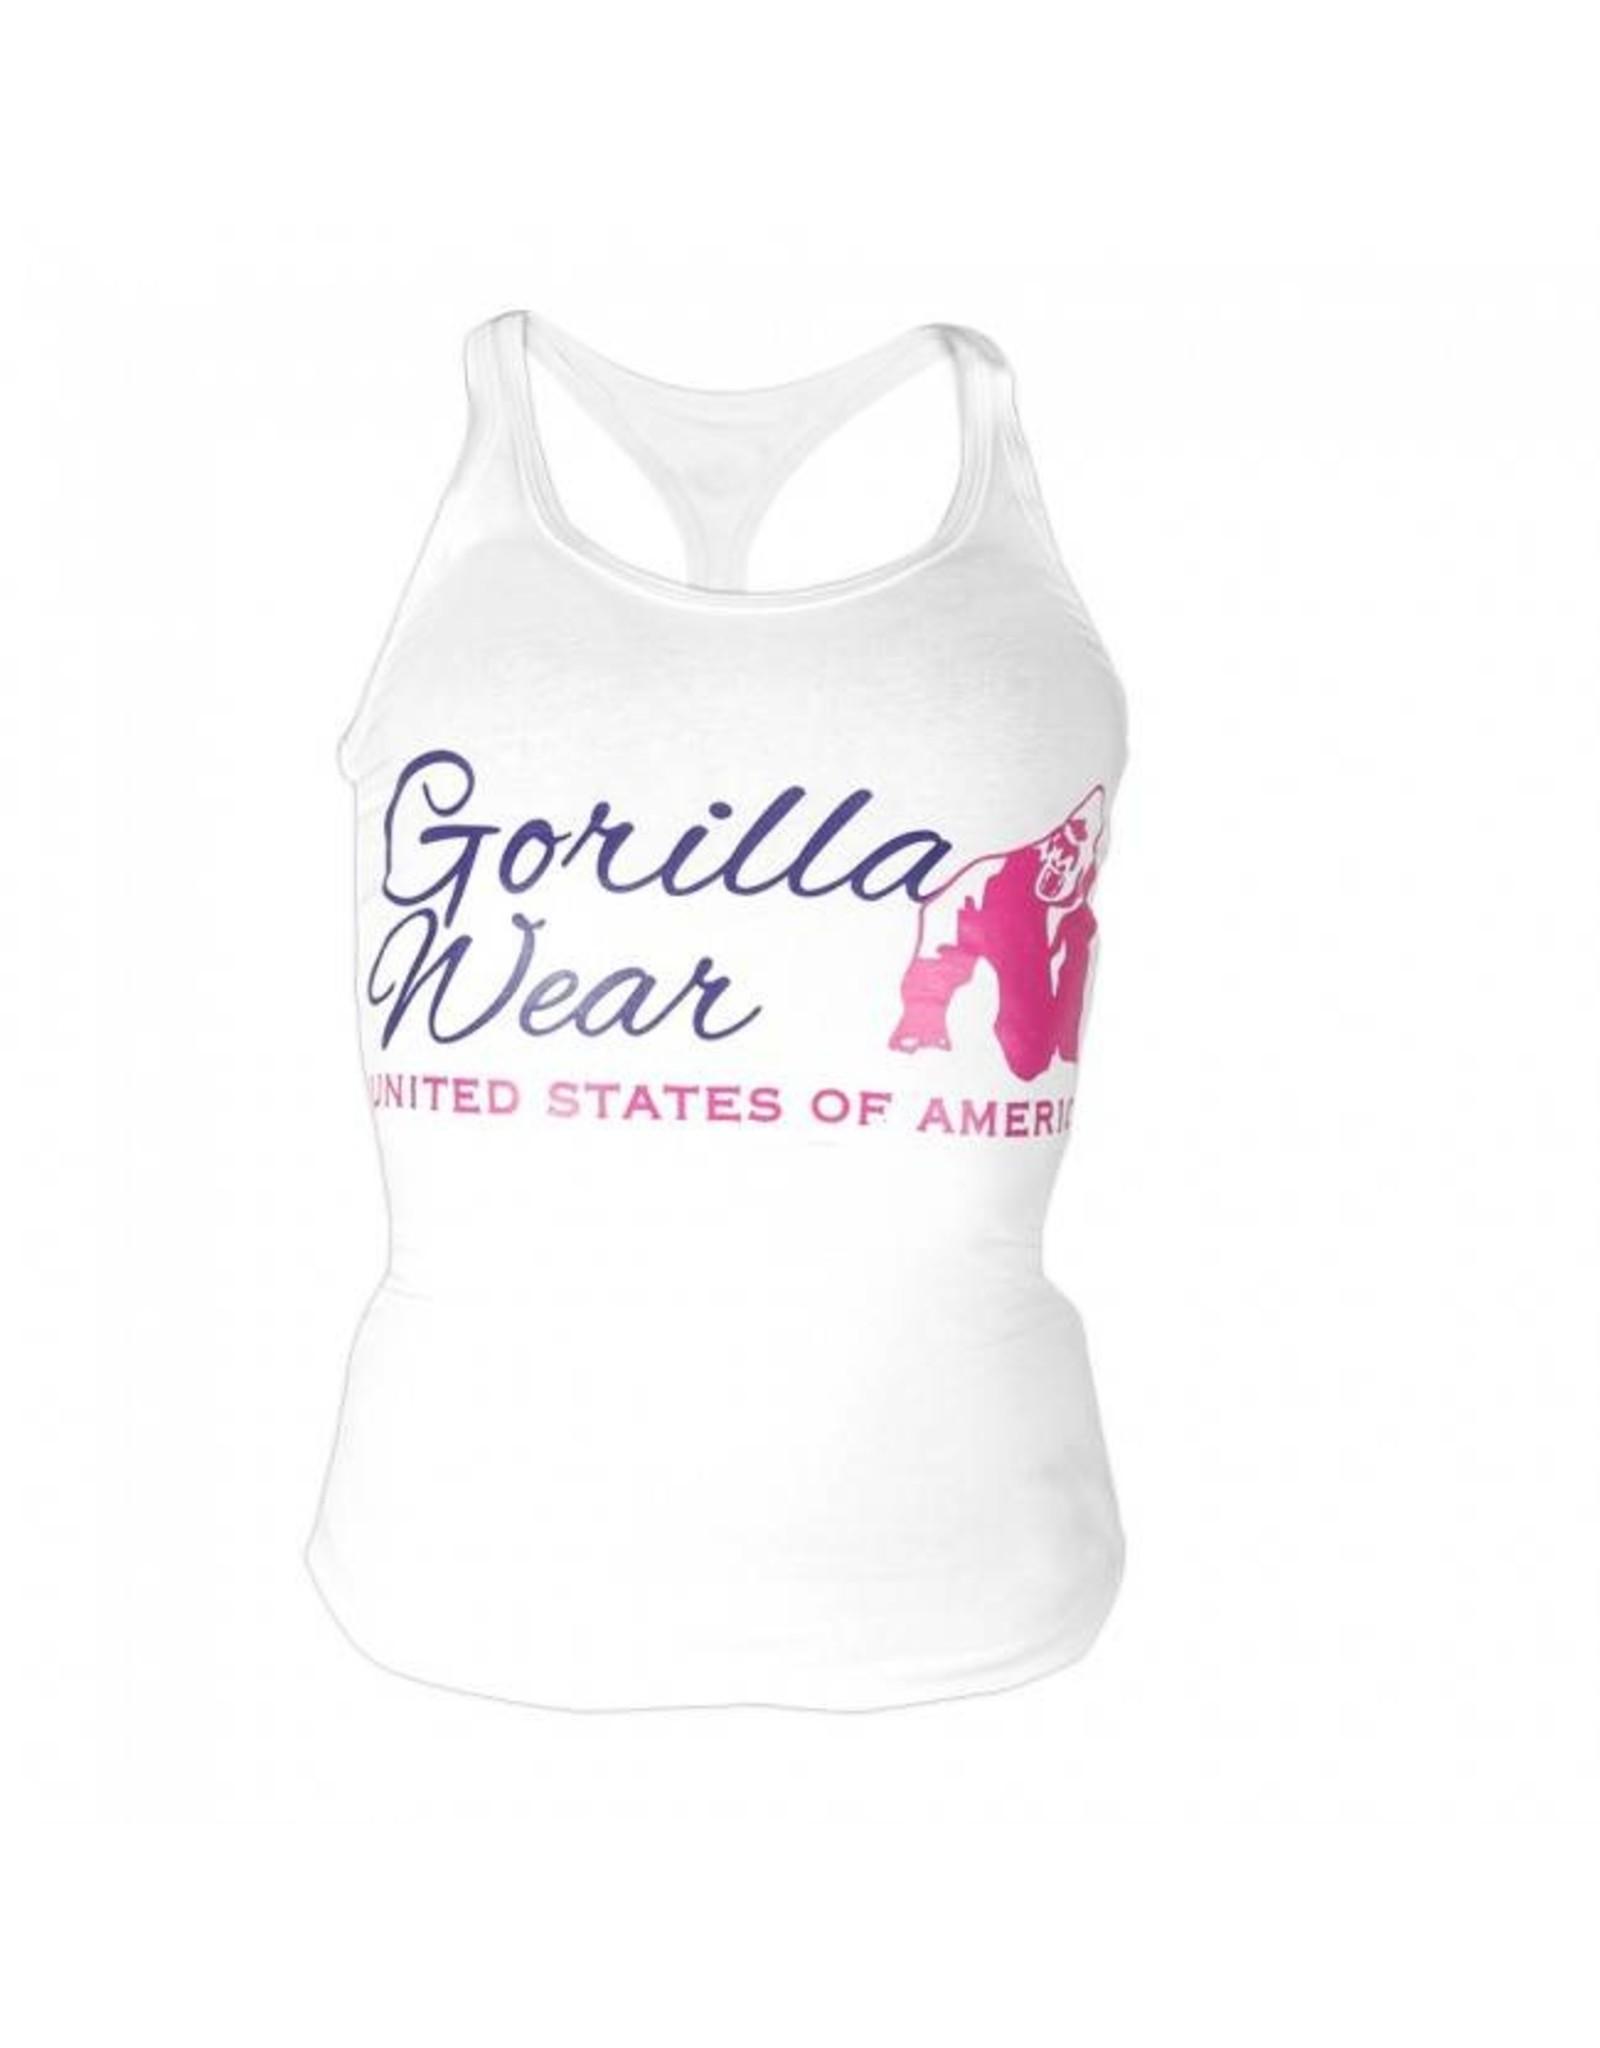 Gorilla Wear Ladies Classic Tank Top - White